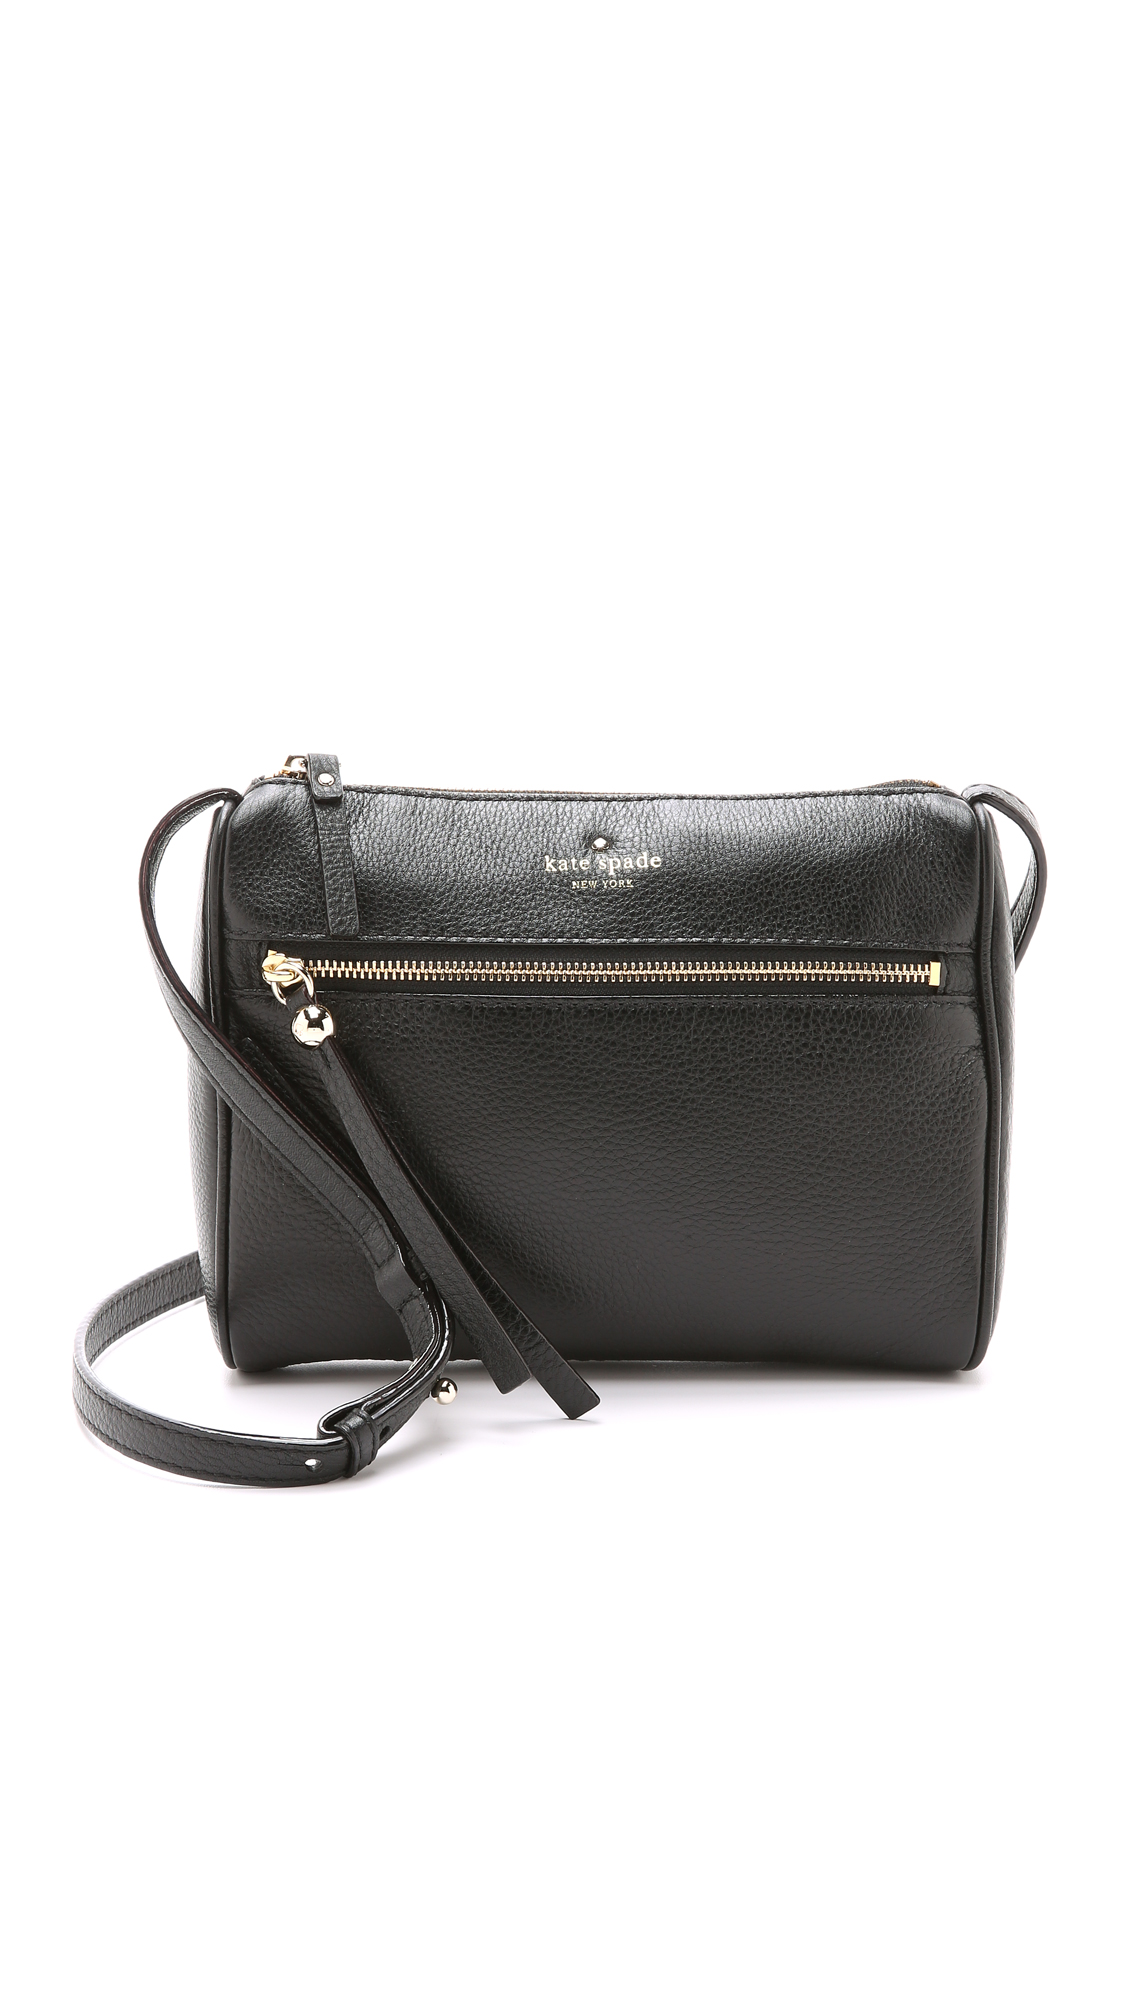 Kate Spade Mini Jackson Street - Cayli Crossbody Bag - Black